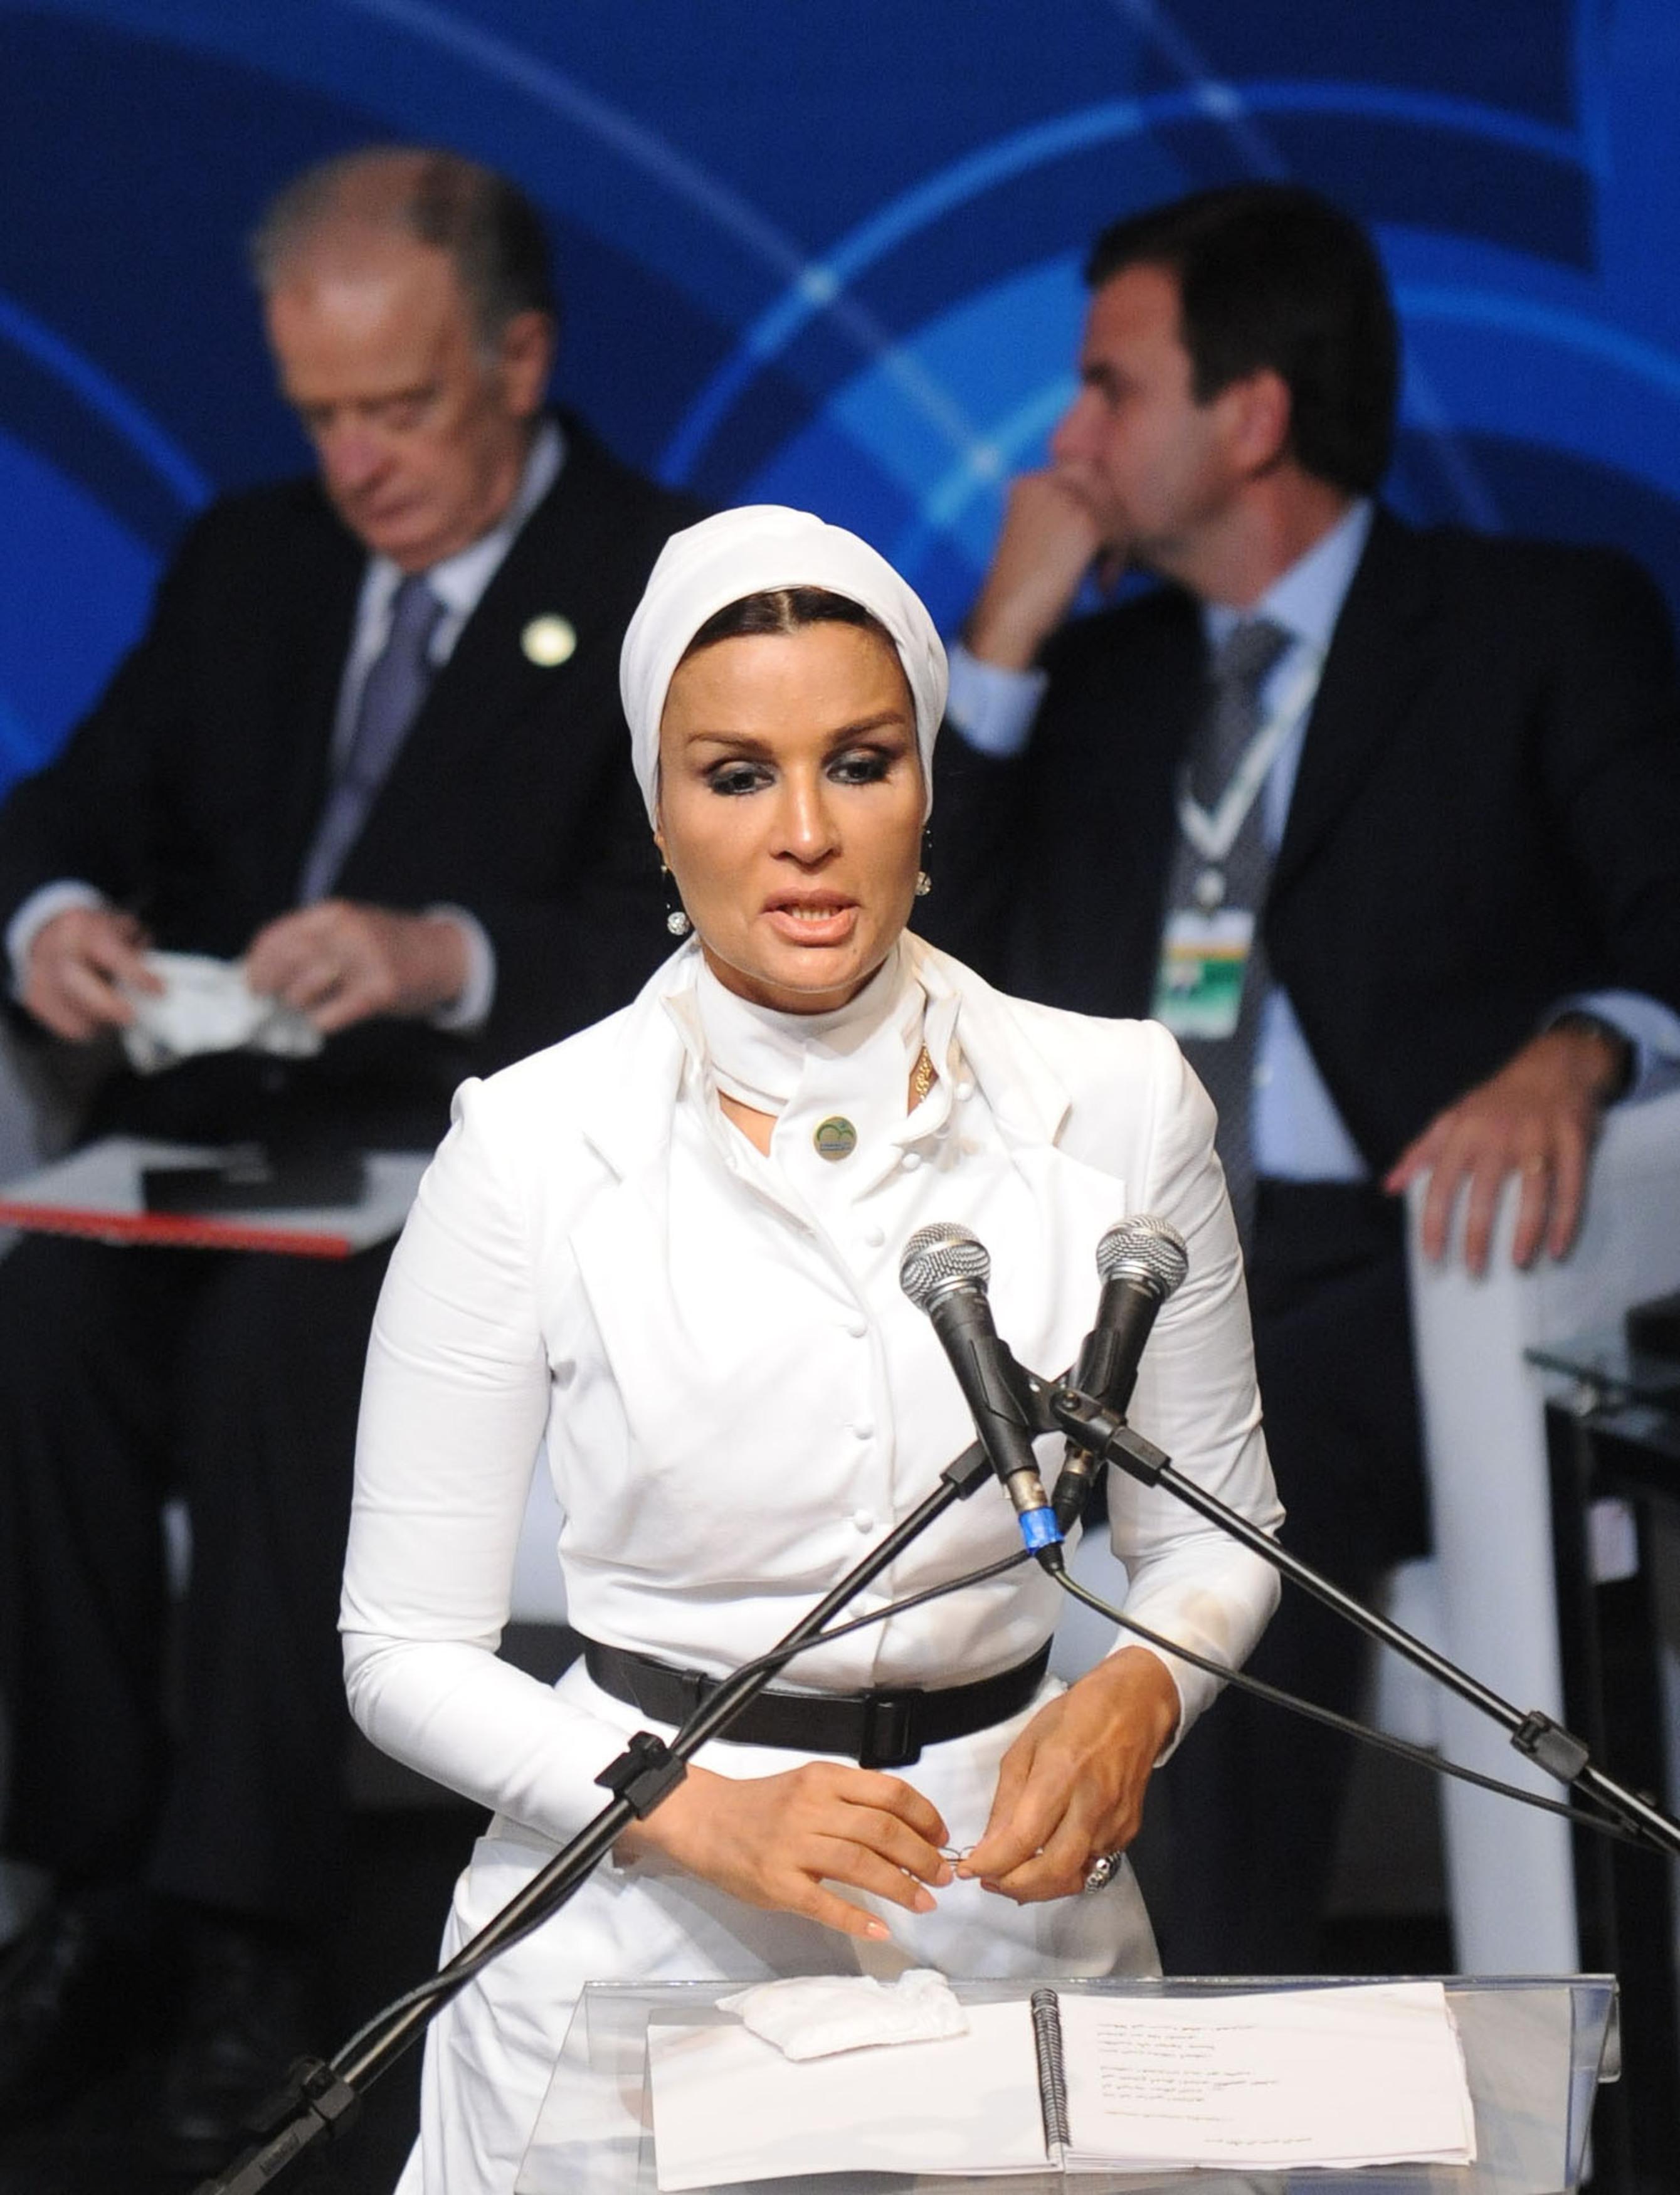 62-år gammel 173 cm høy Sheikha Moza i 2021